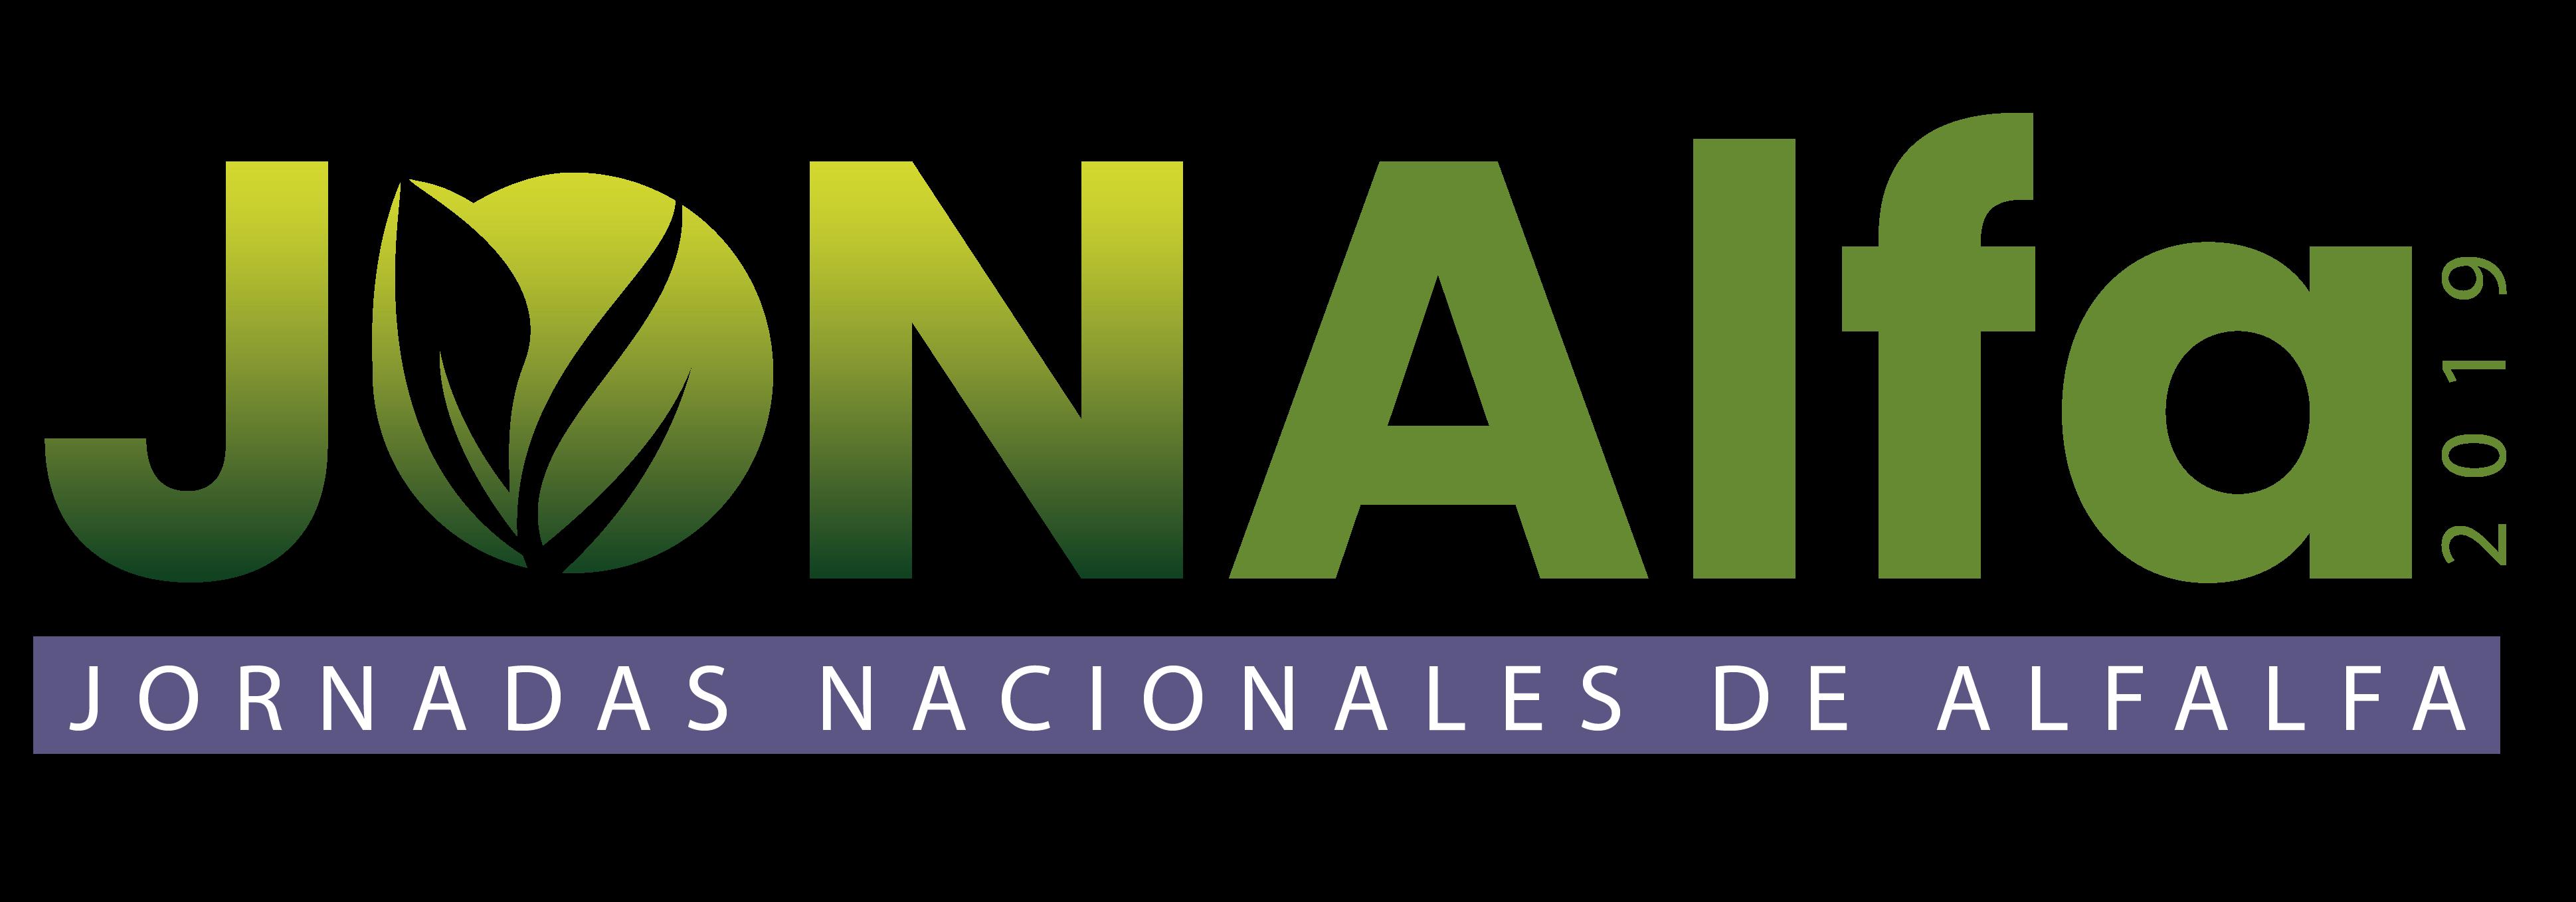 Resultado de imagen para jonalfa 2019. logo